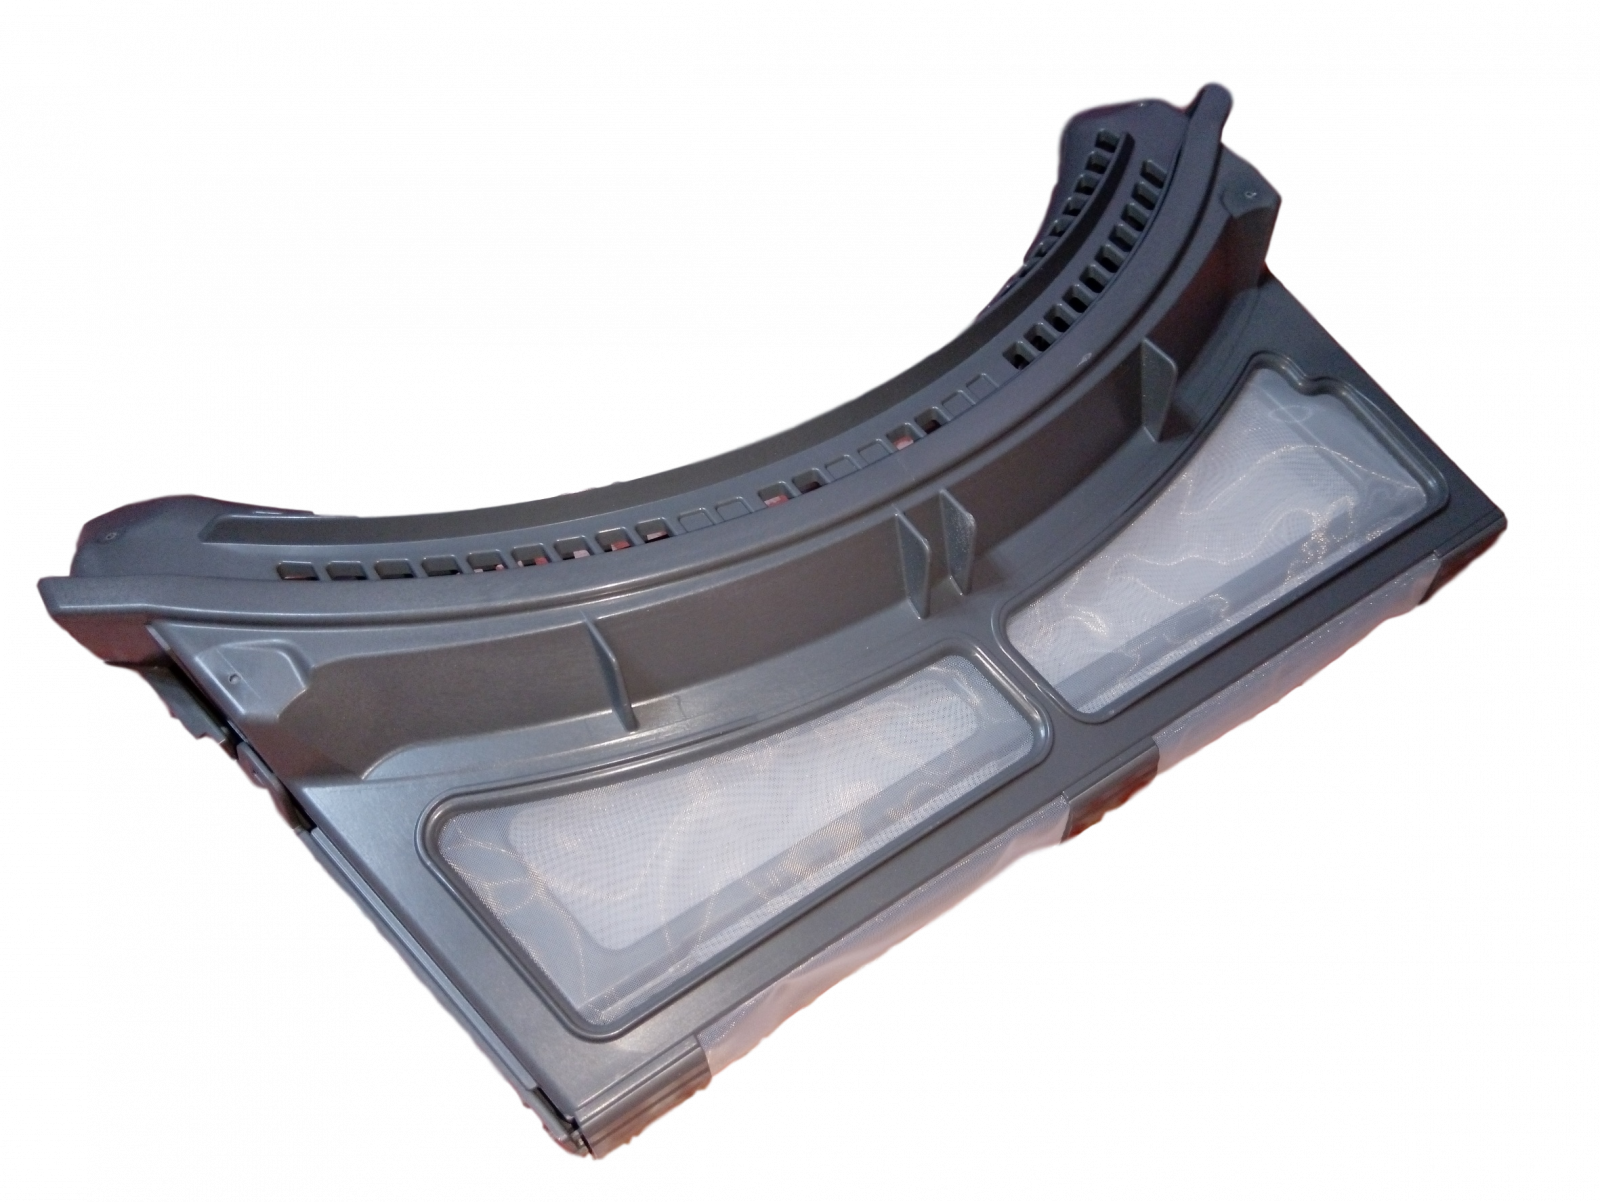 Vzduchový filtr do sušičky Whirlpool - 488000534079 Whirlpool / Indesit